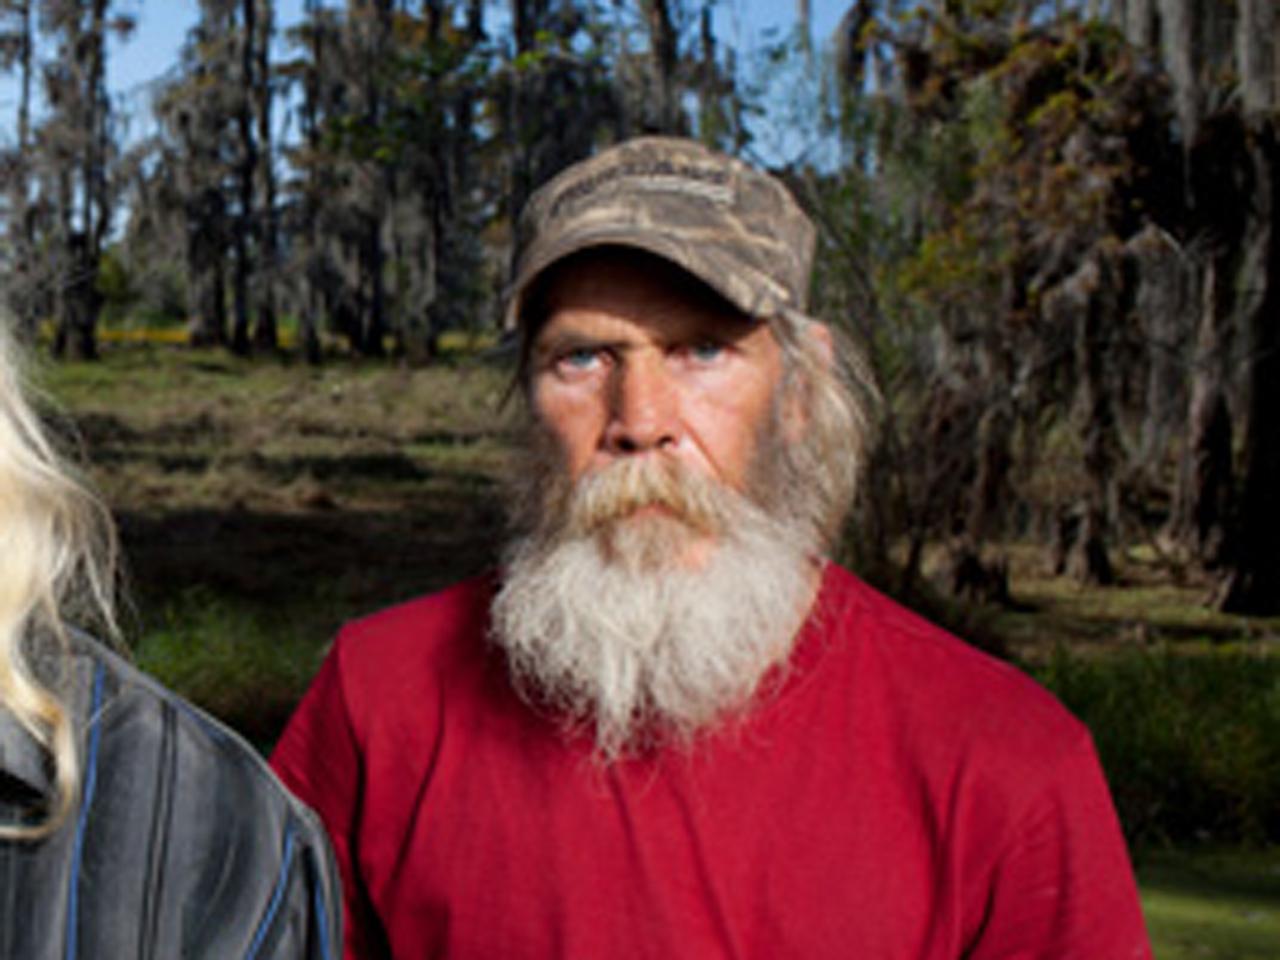 Mitchell Guist Swamp People Star Dies At 48 Cbs News